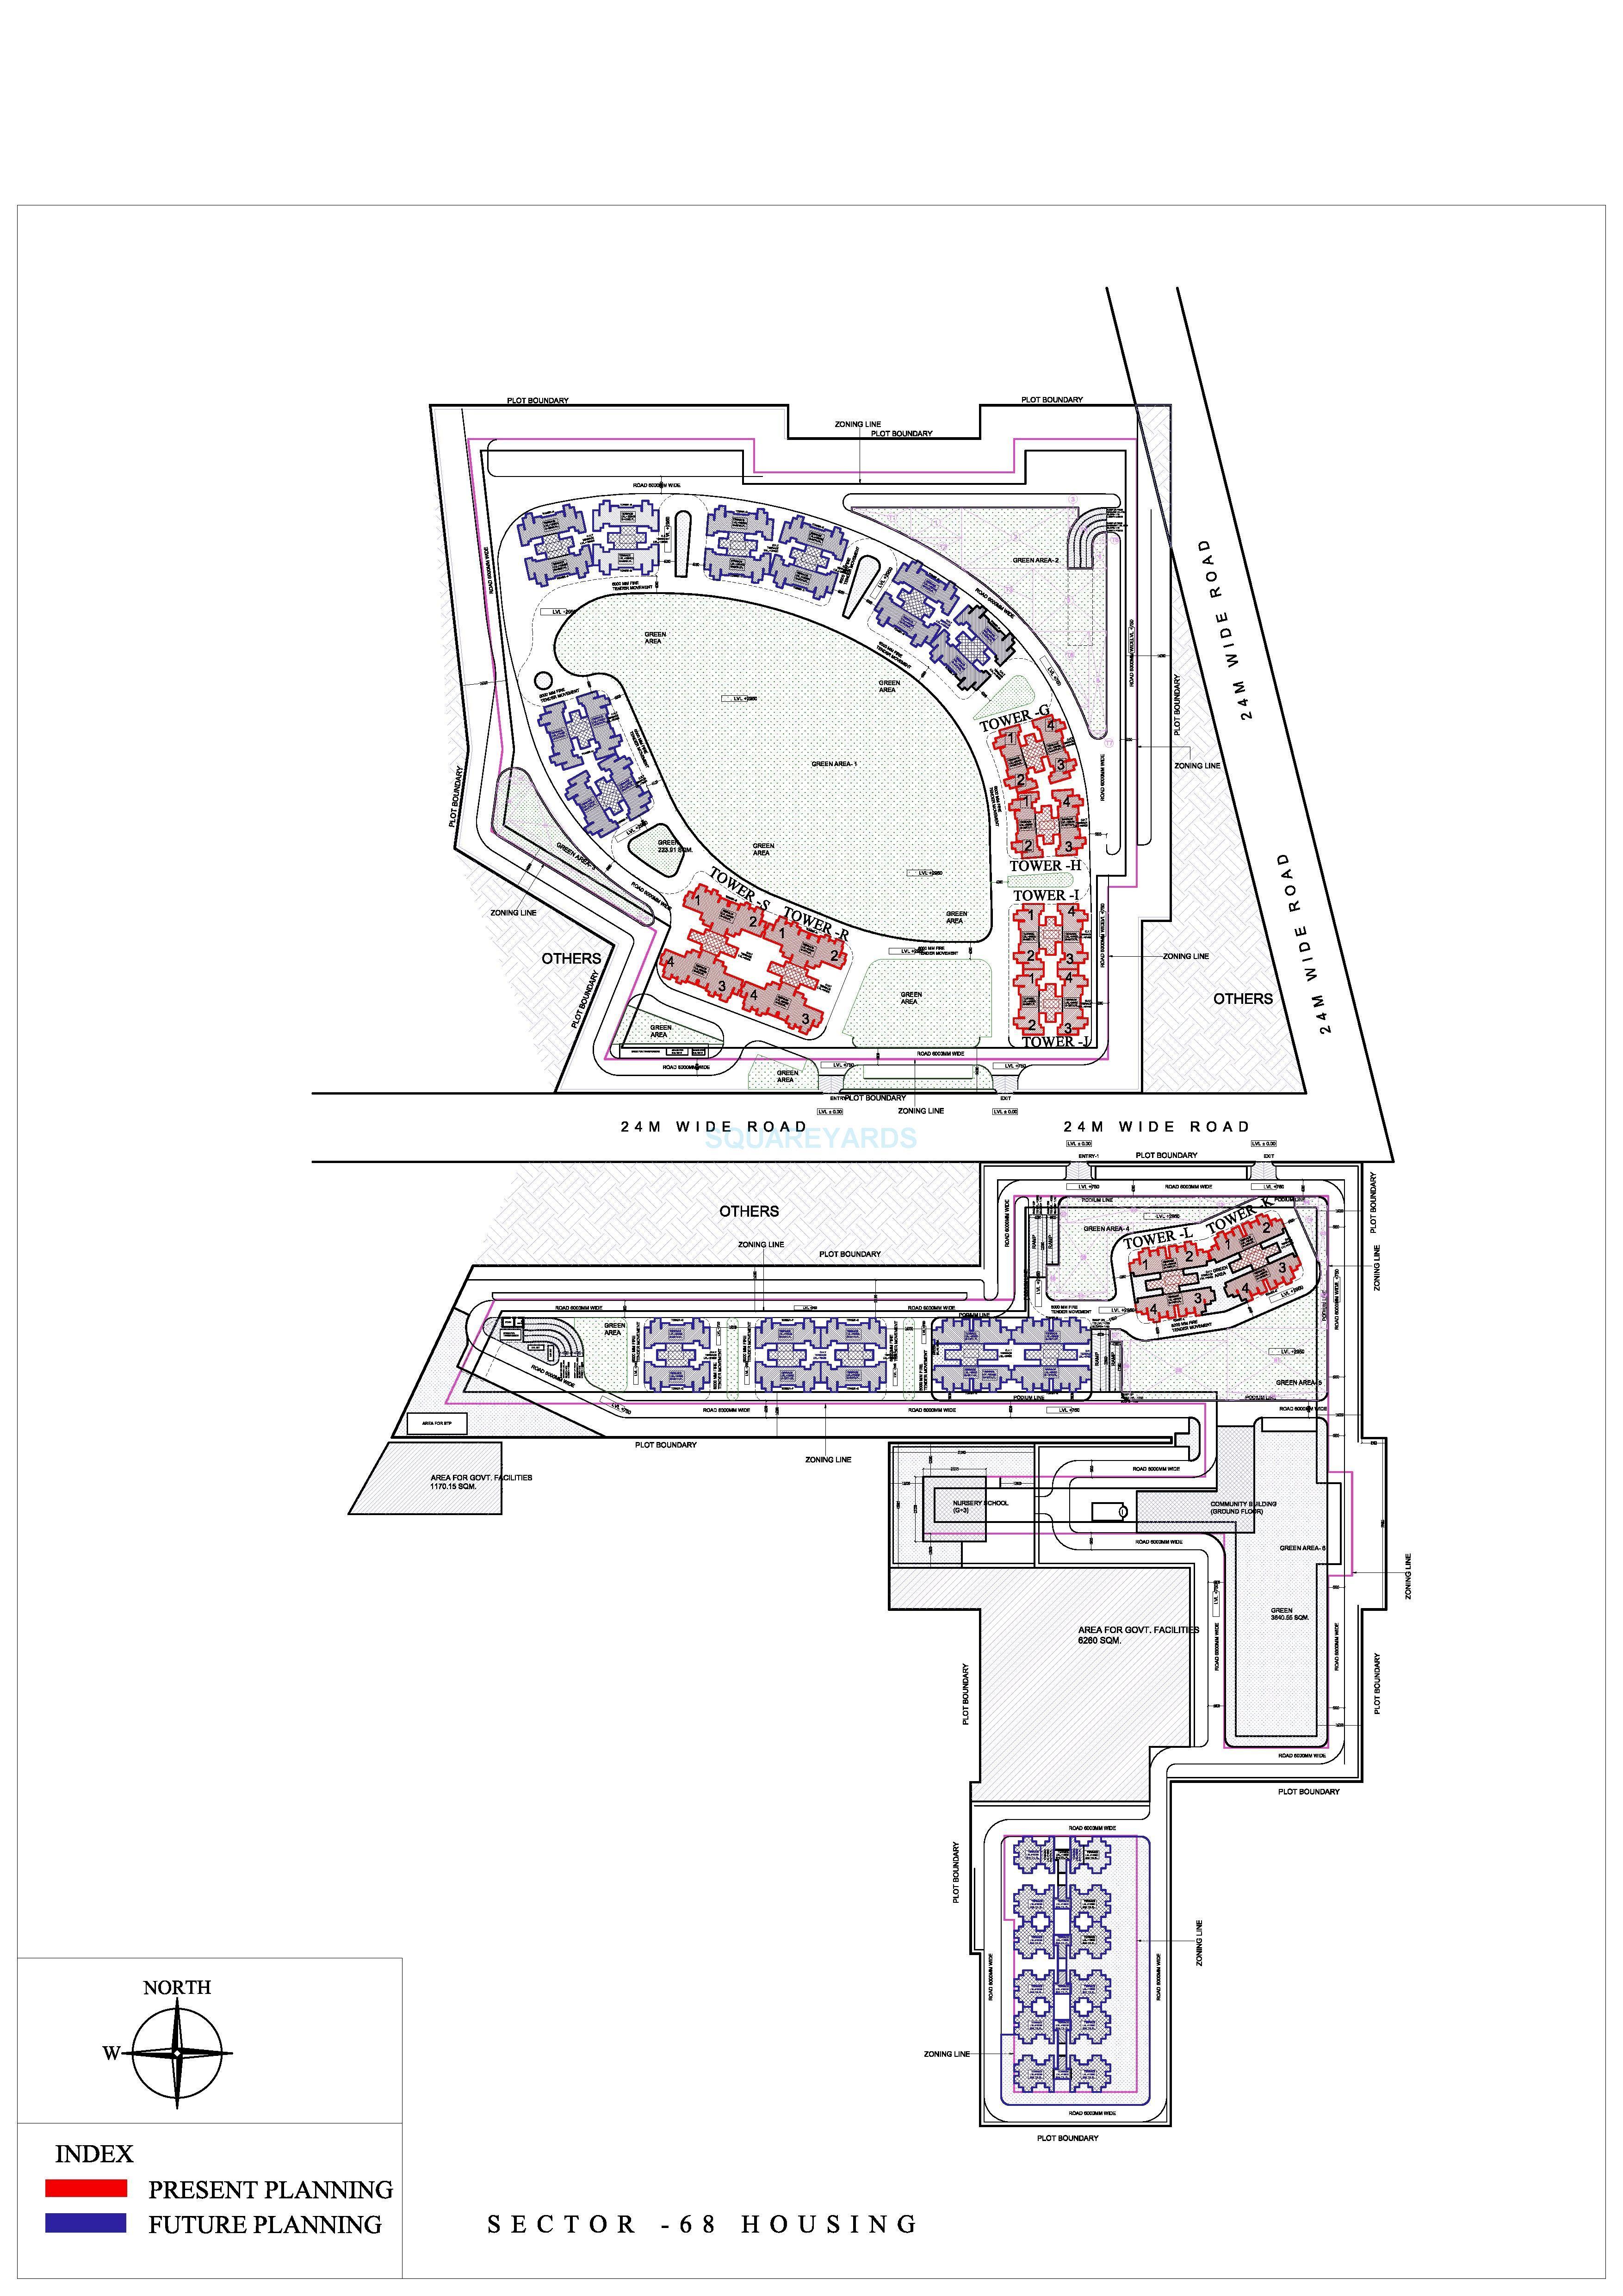 supertech hues master plan image1